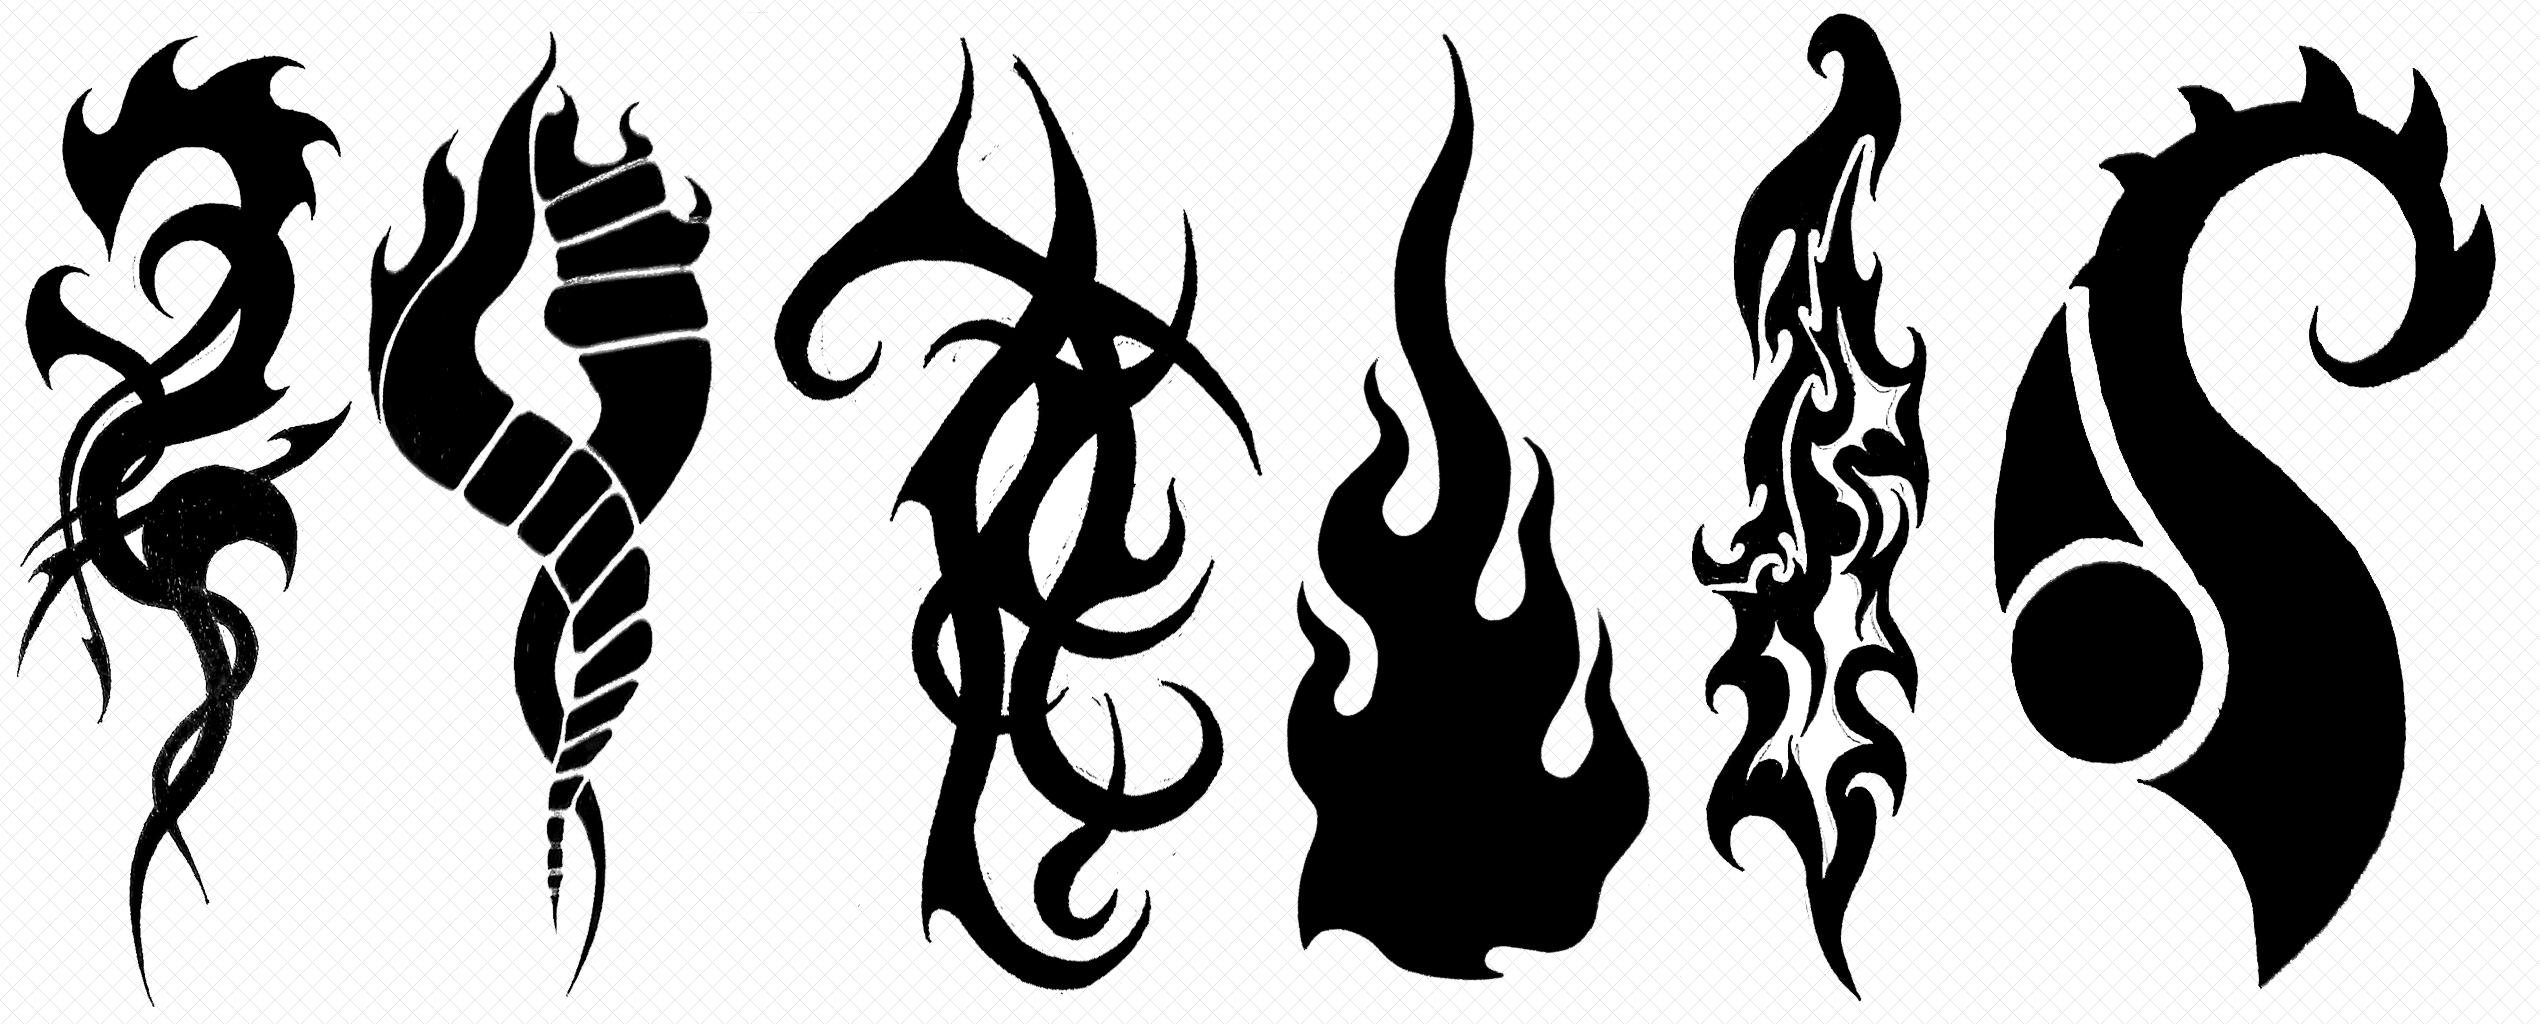 tattoos iii black abstract by eel ecurb on deviantart. Black Bedroom Furniture Sets. Home Design Ideas